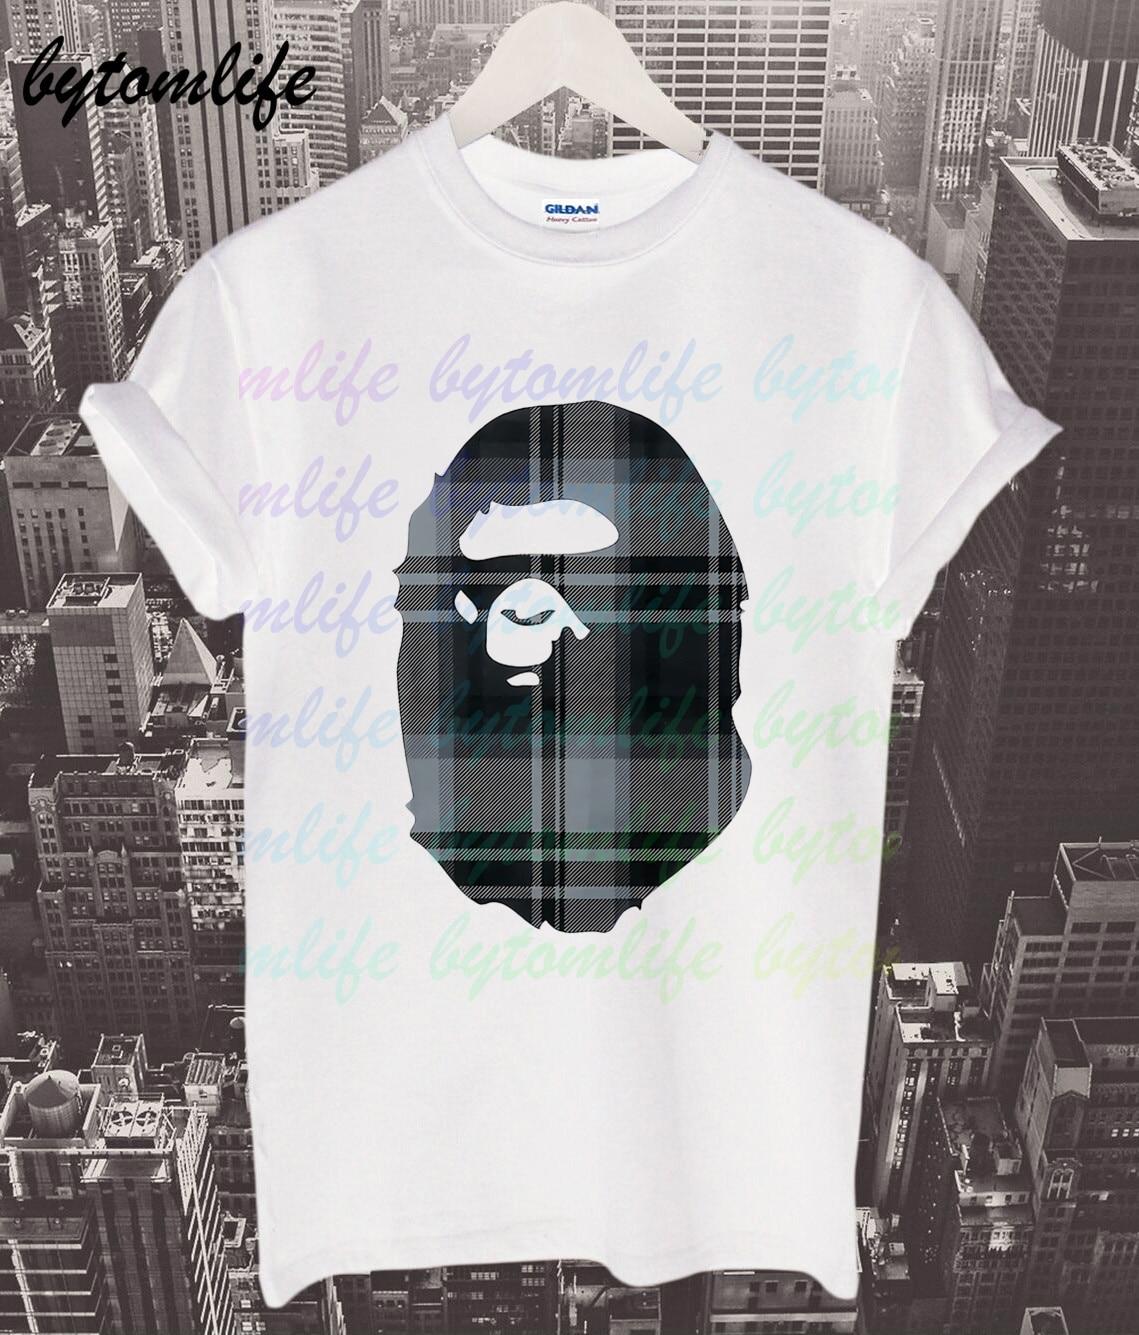 A Bathing T-shirt Summer Print Ape White Black T Shirt Clothes Popular Shirt Cotton Tees Amazing Short Sleeve Unique Men Tops